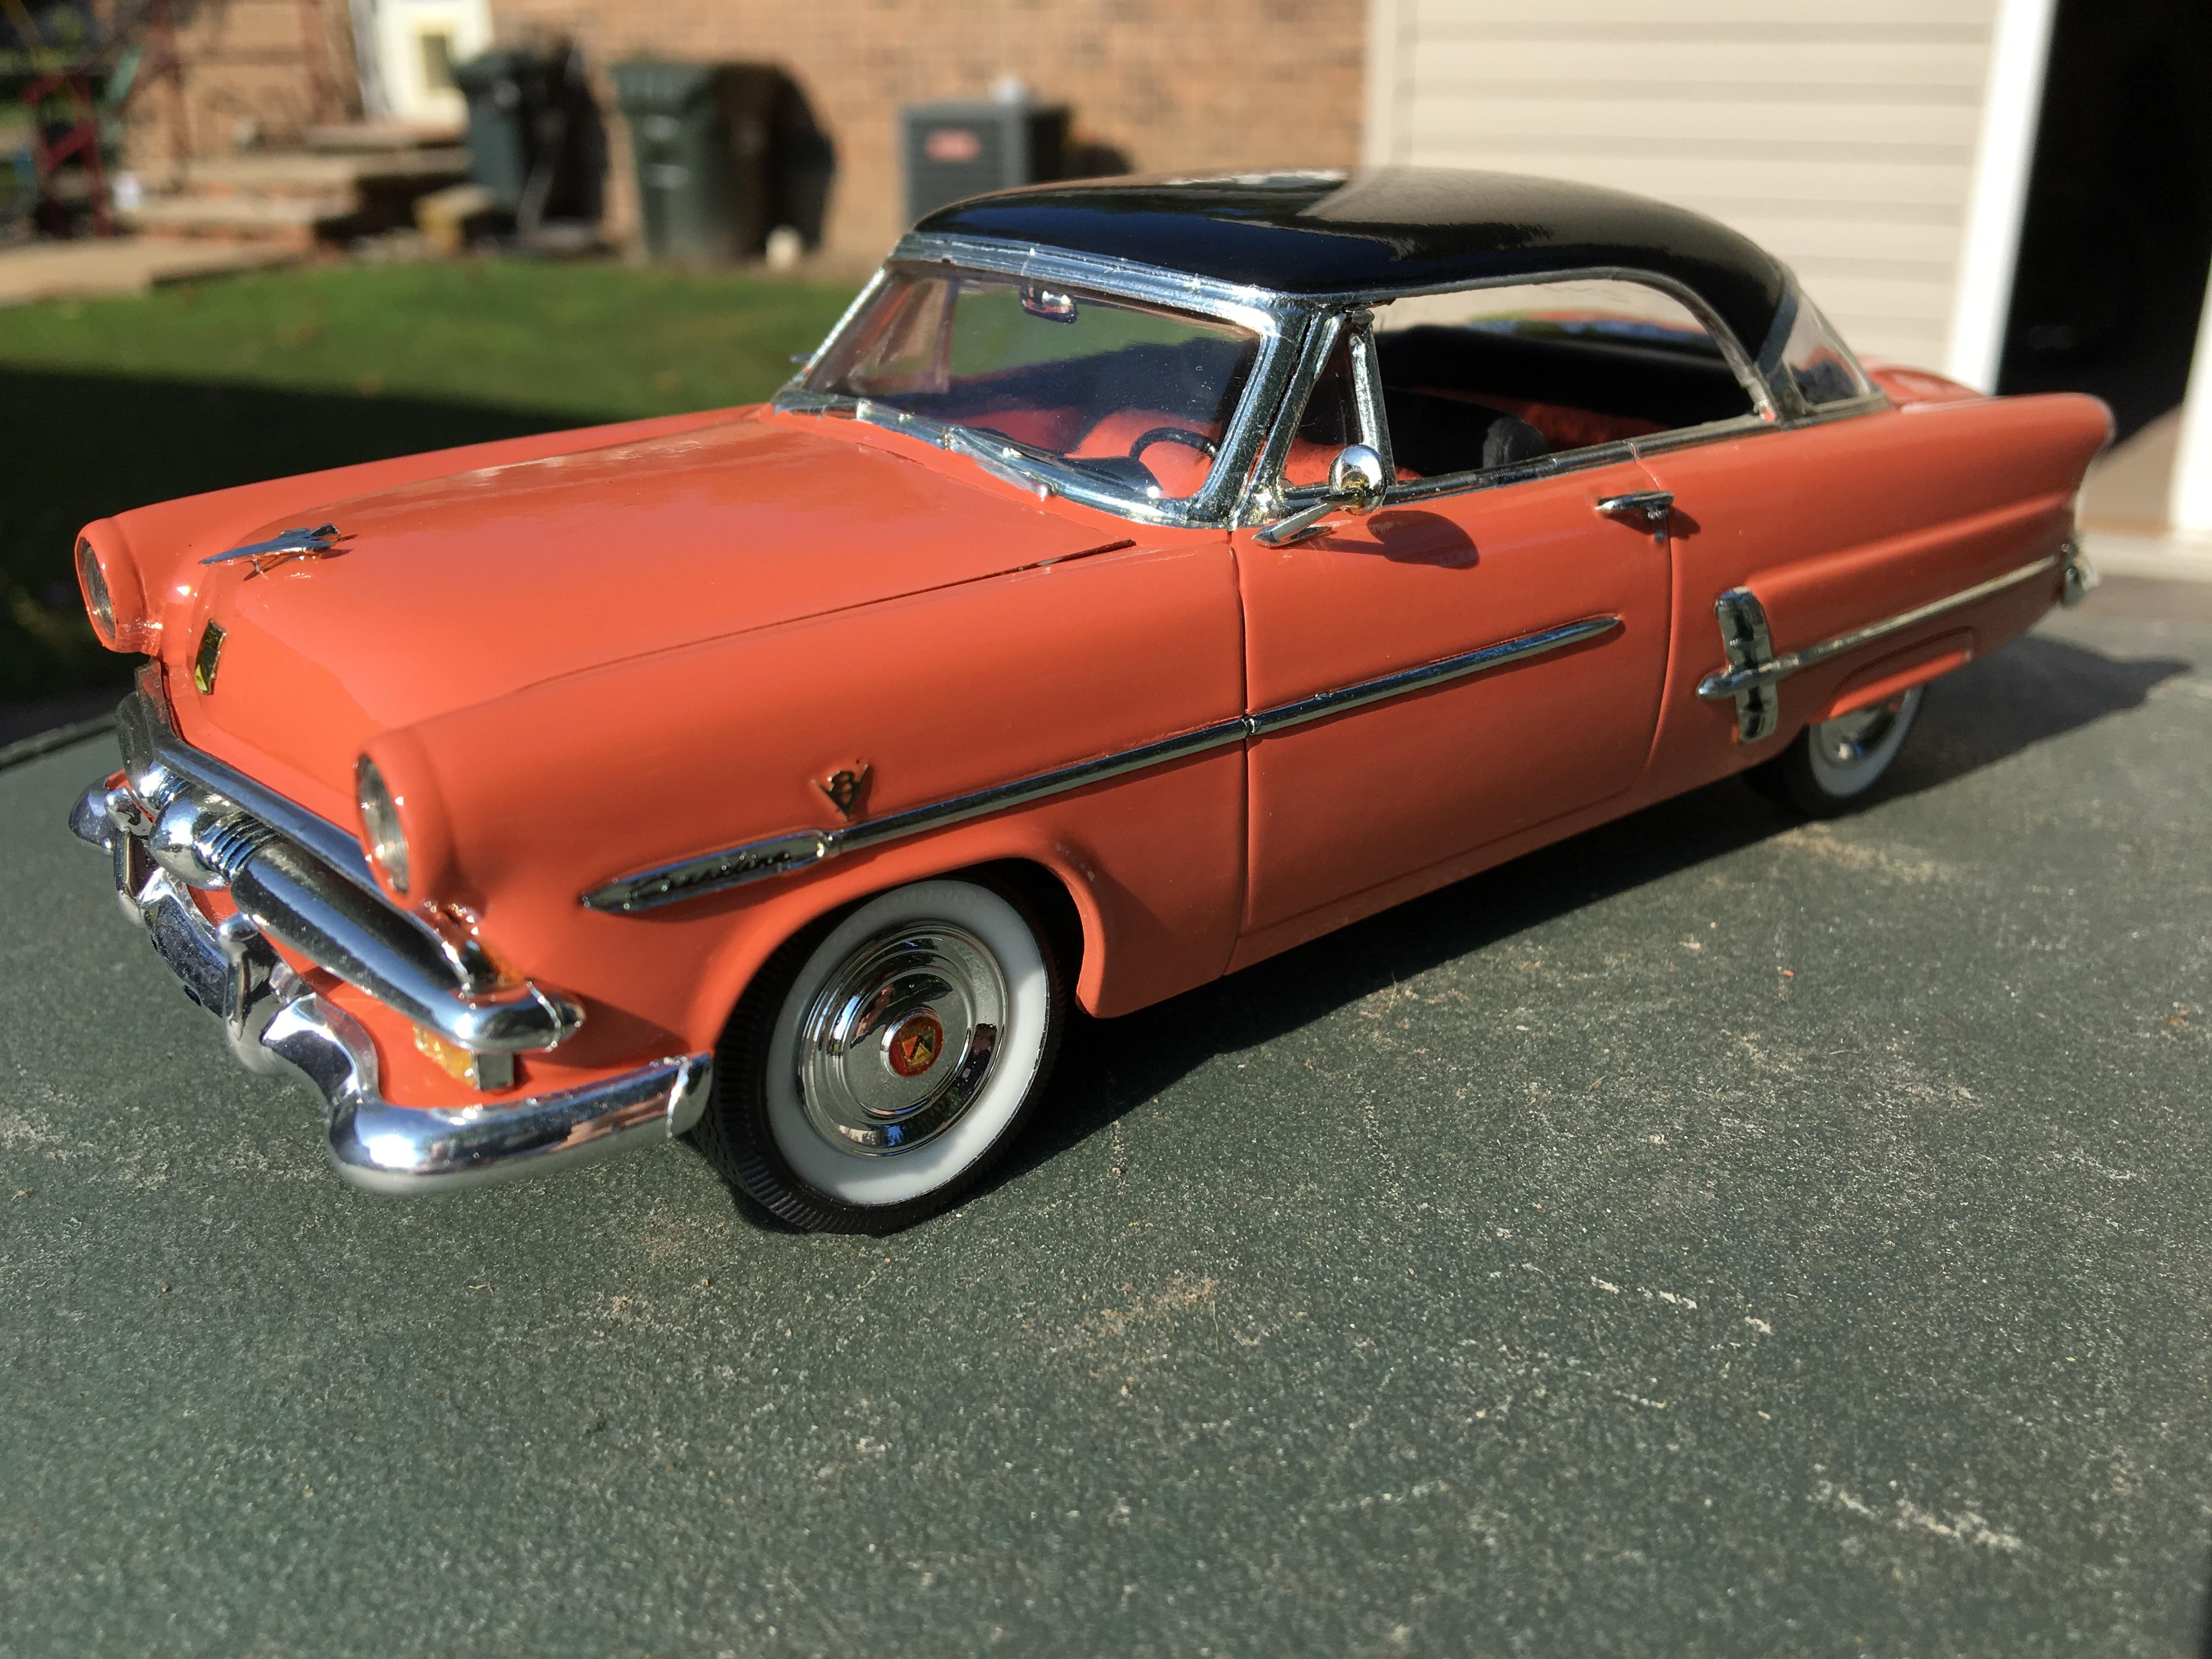 Martinez Used Cars >> 1953 Ford Victoria - Under Glass - Model Cars Magazine Forum